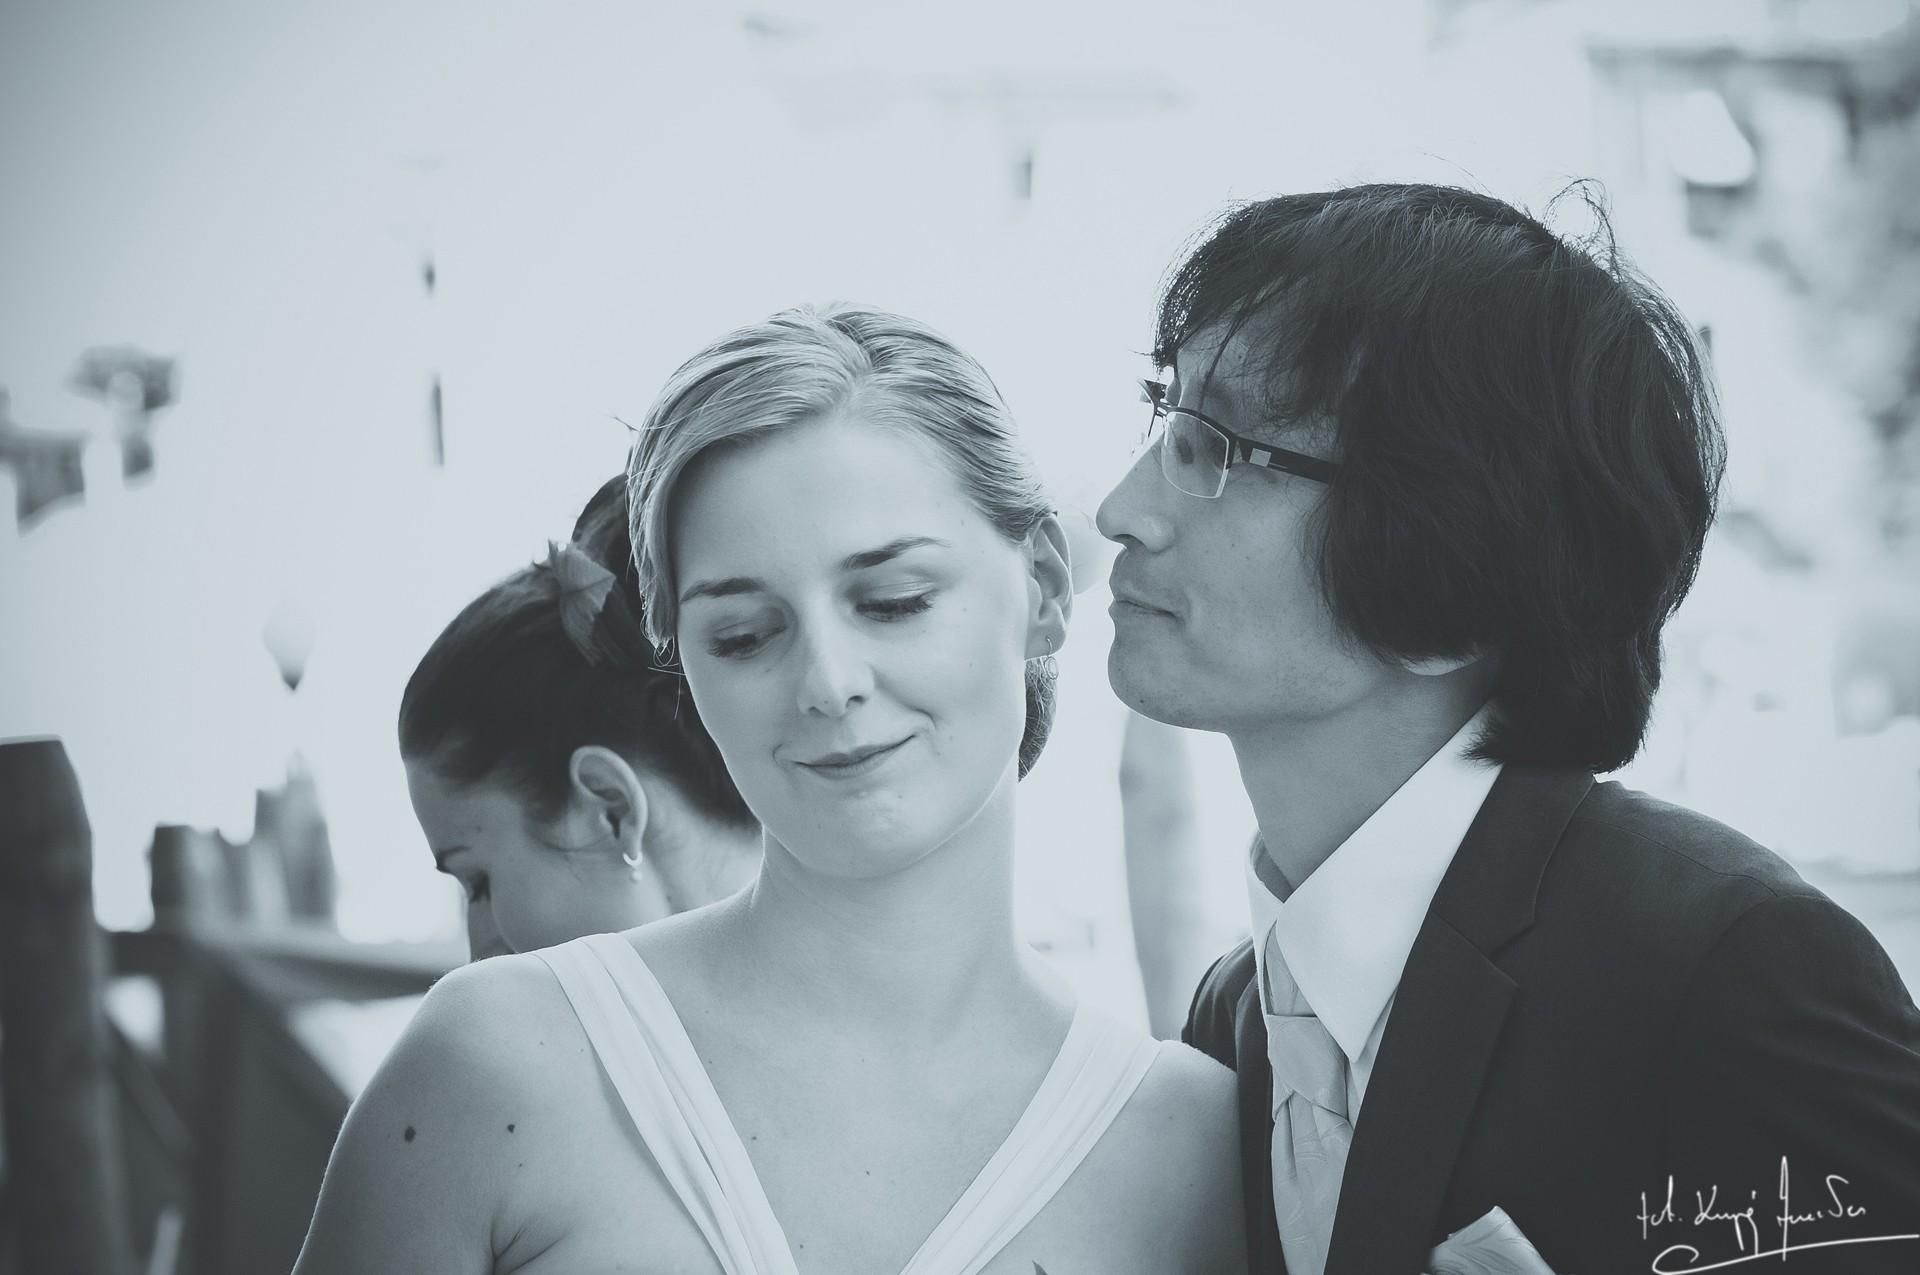 Ślub w wenecji 20 Manuela Luiza & Young Seon Song